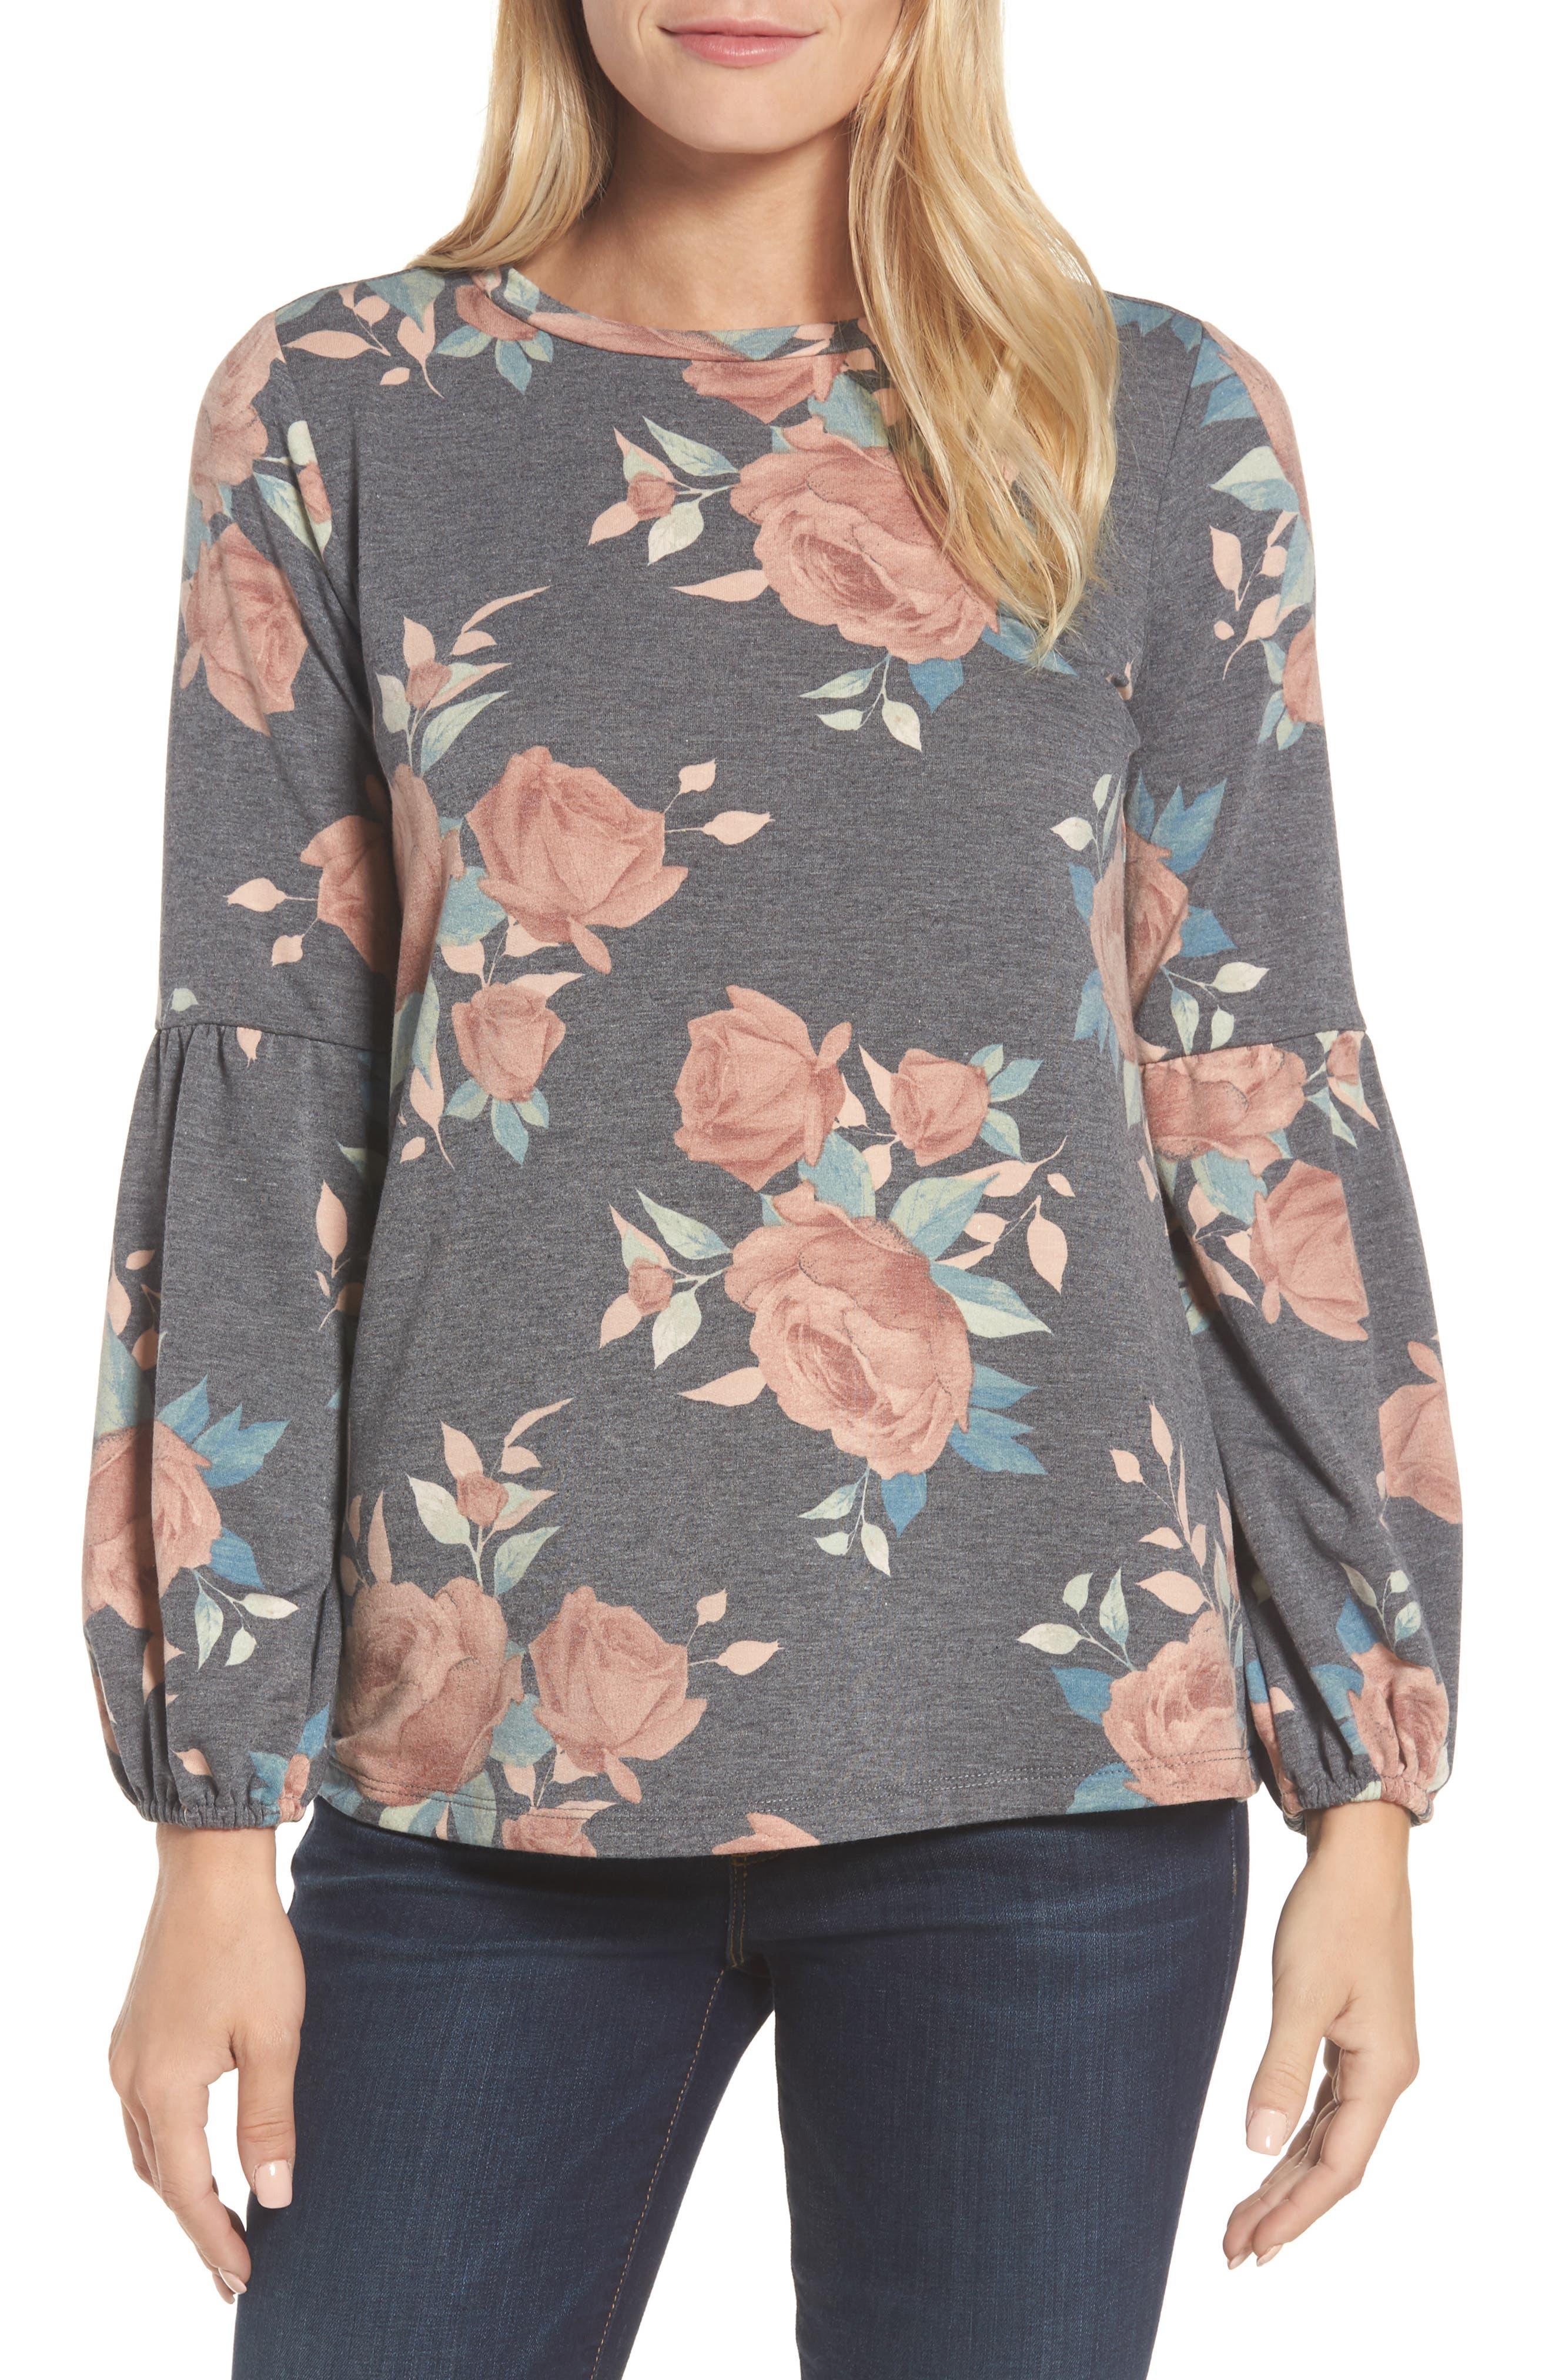 Floral Print Balloon Sleeve Sweatshirt,                         Main,                         color, Black/ Blush